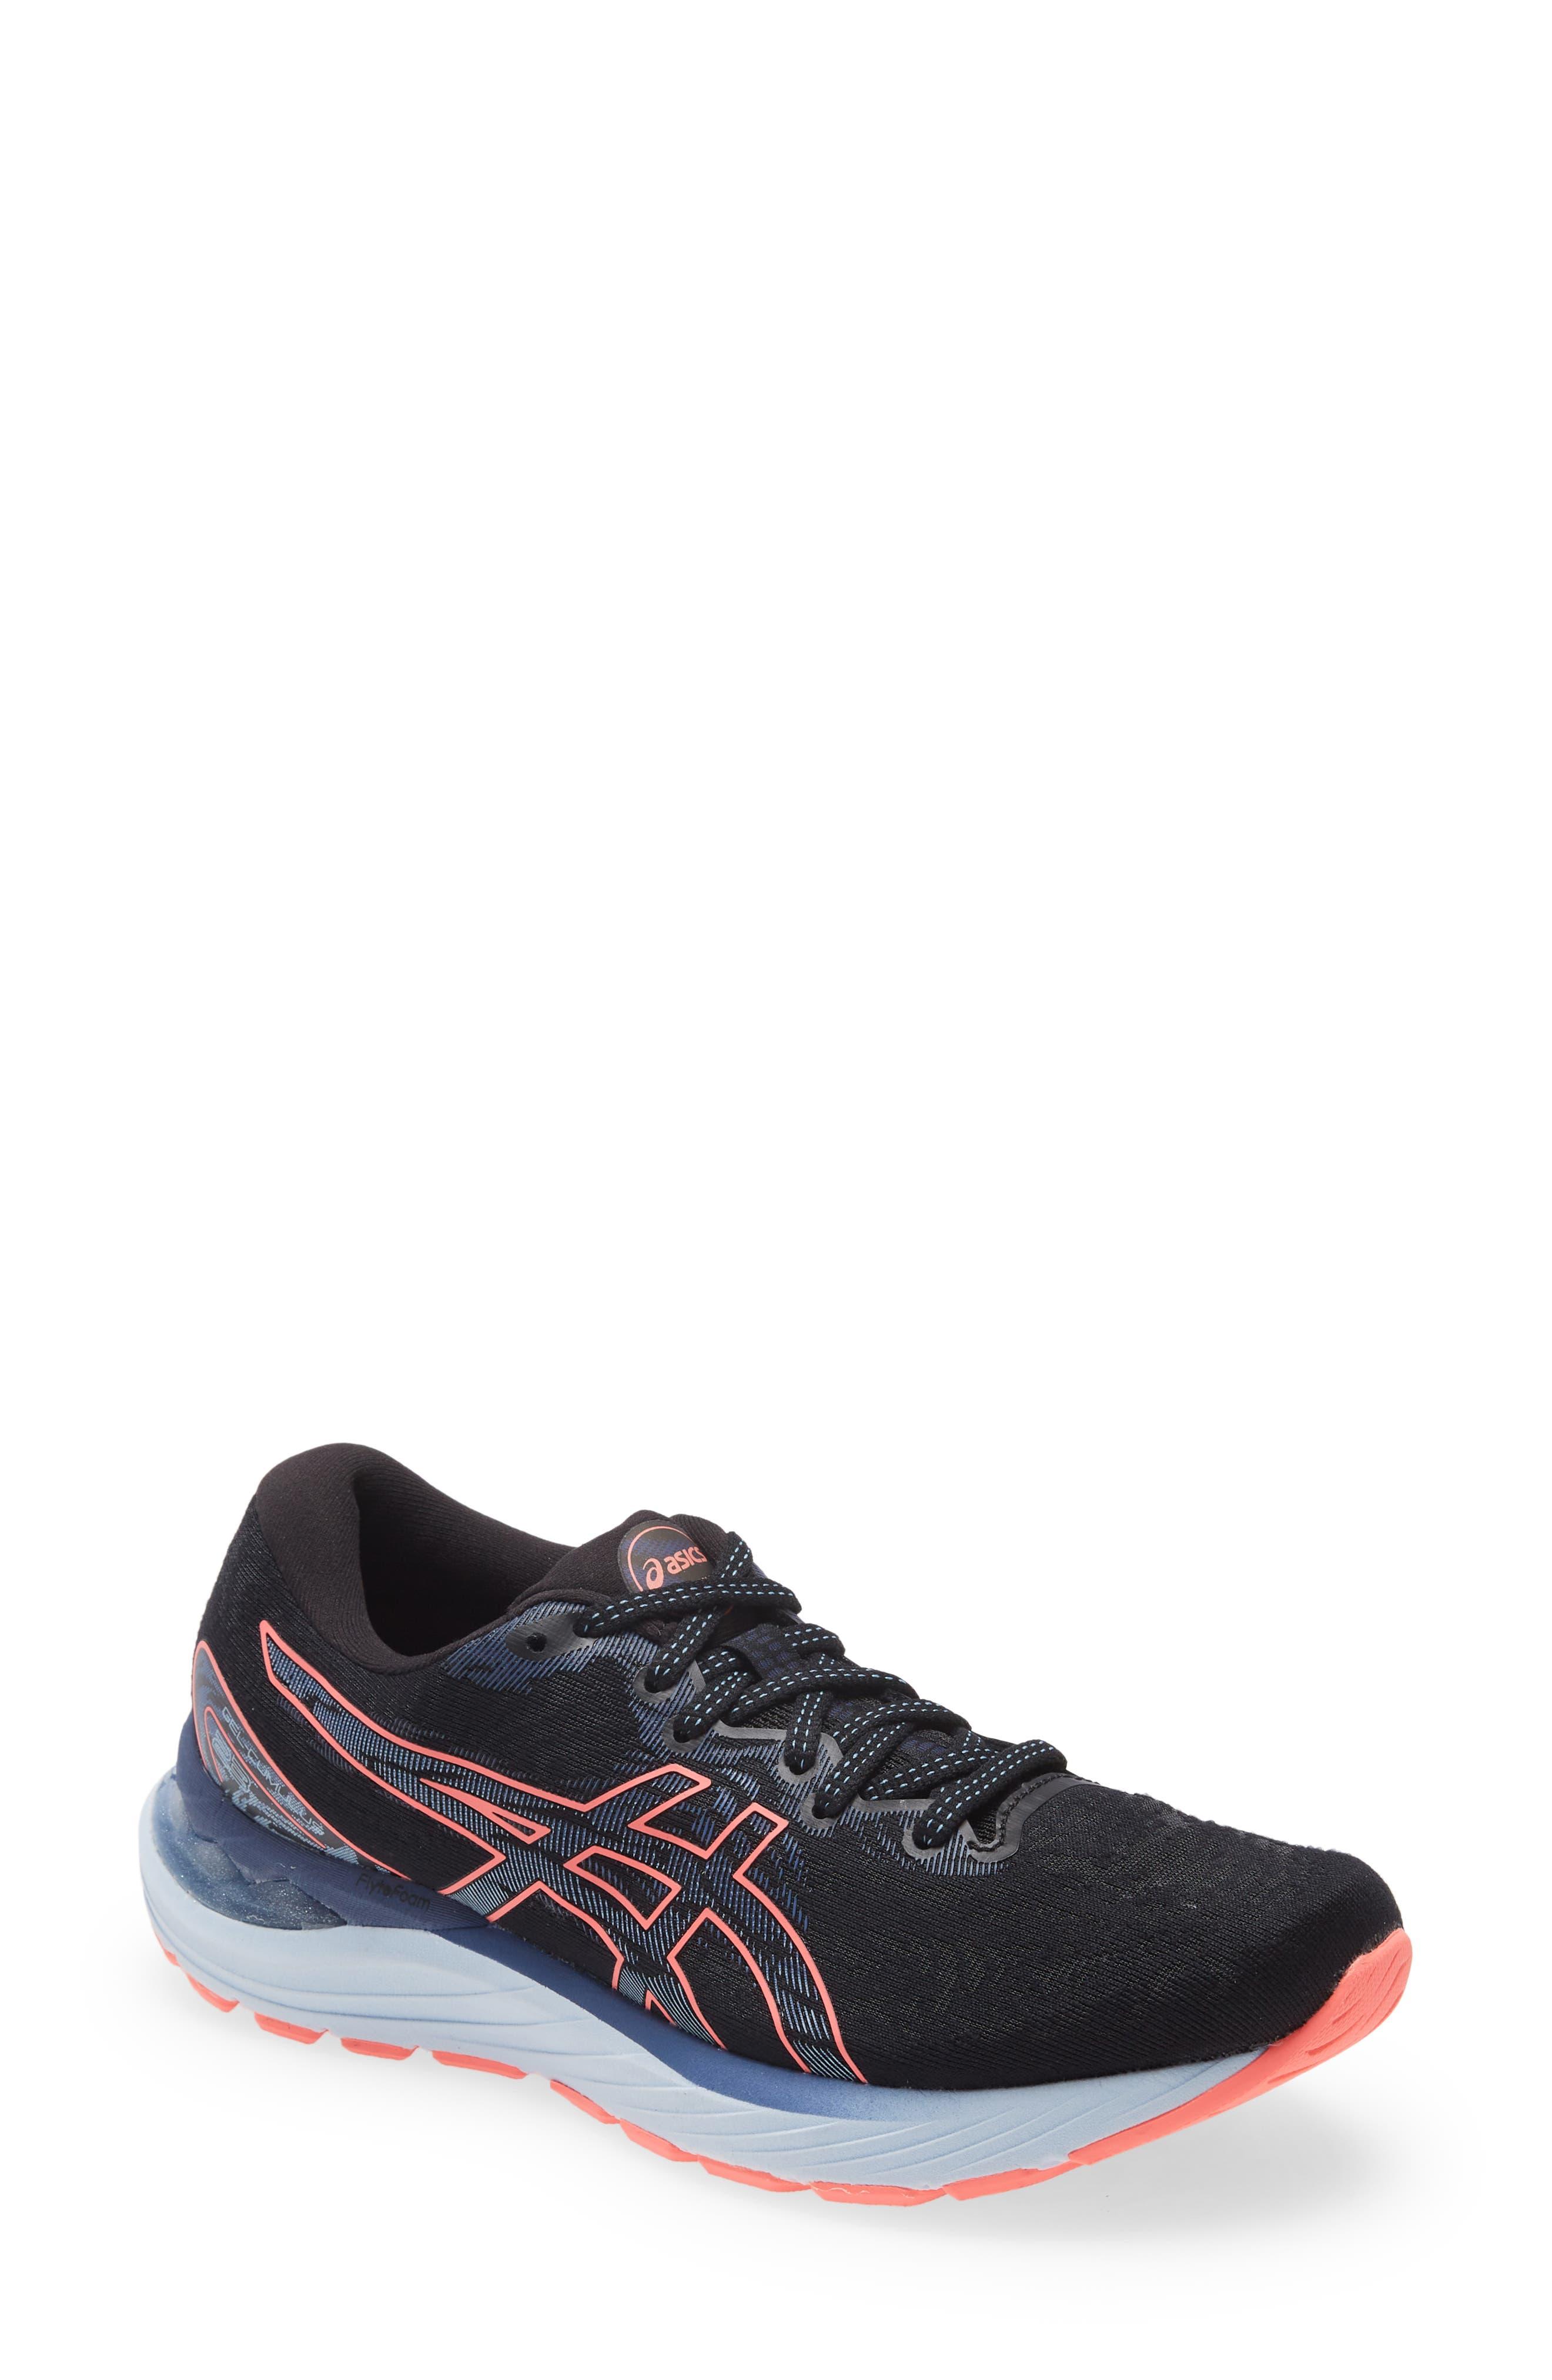 Women's Asics Gel-Cumulus 23 Running Shoe